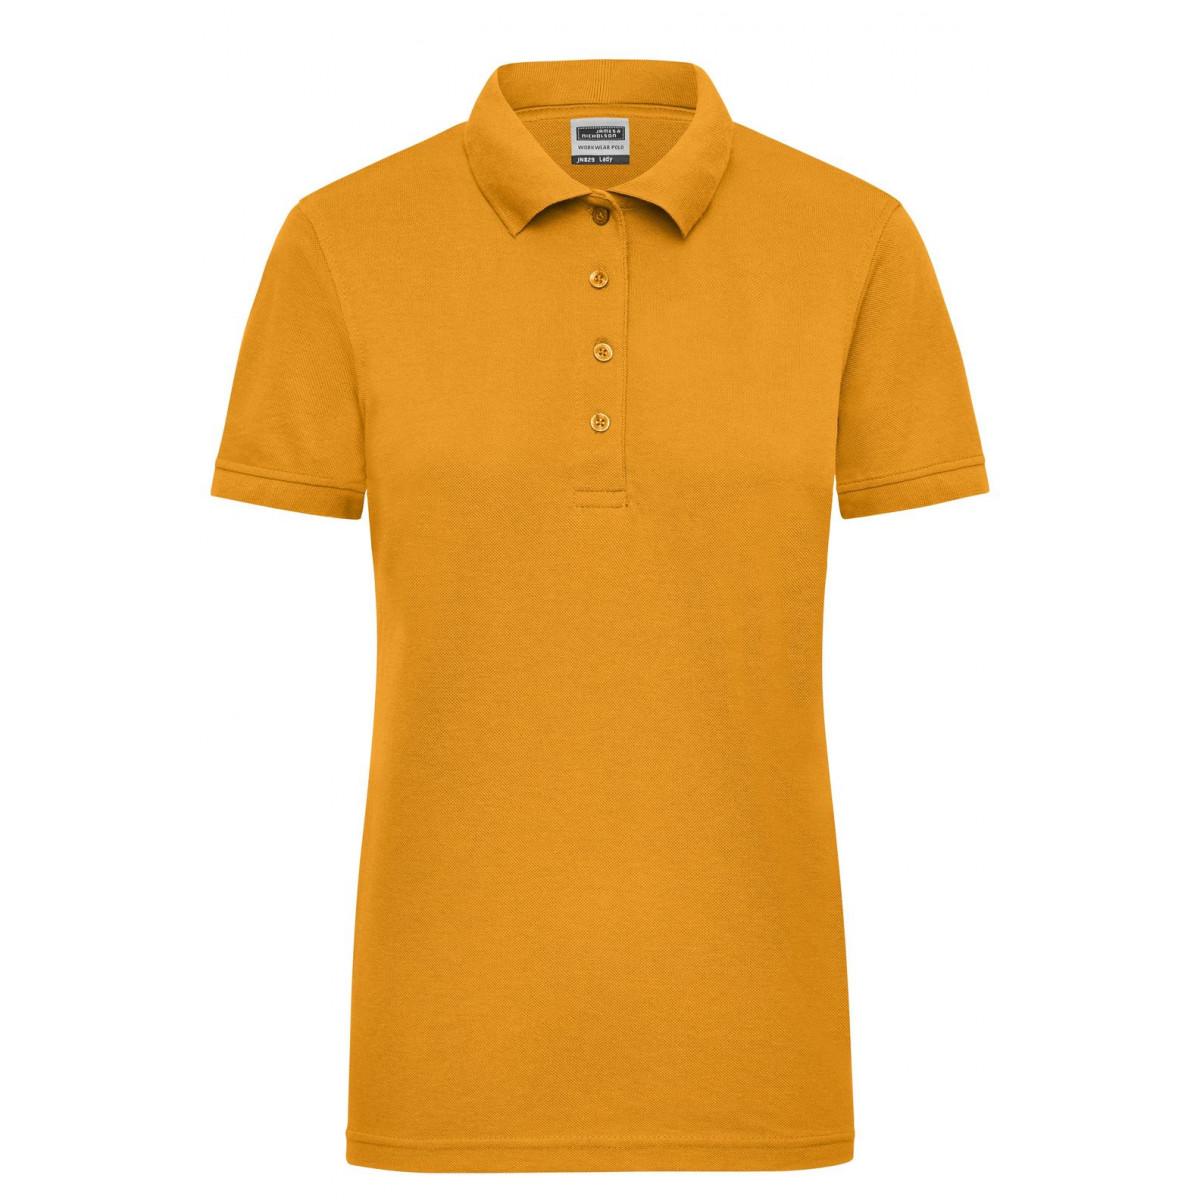 Рубашка поло женская JN829 Ladies Workwear Polo - Золоистый желтый